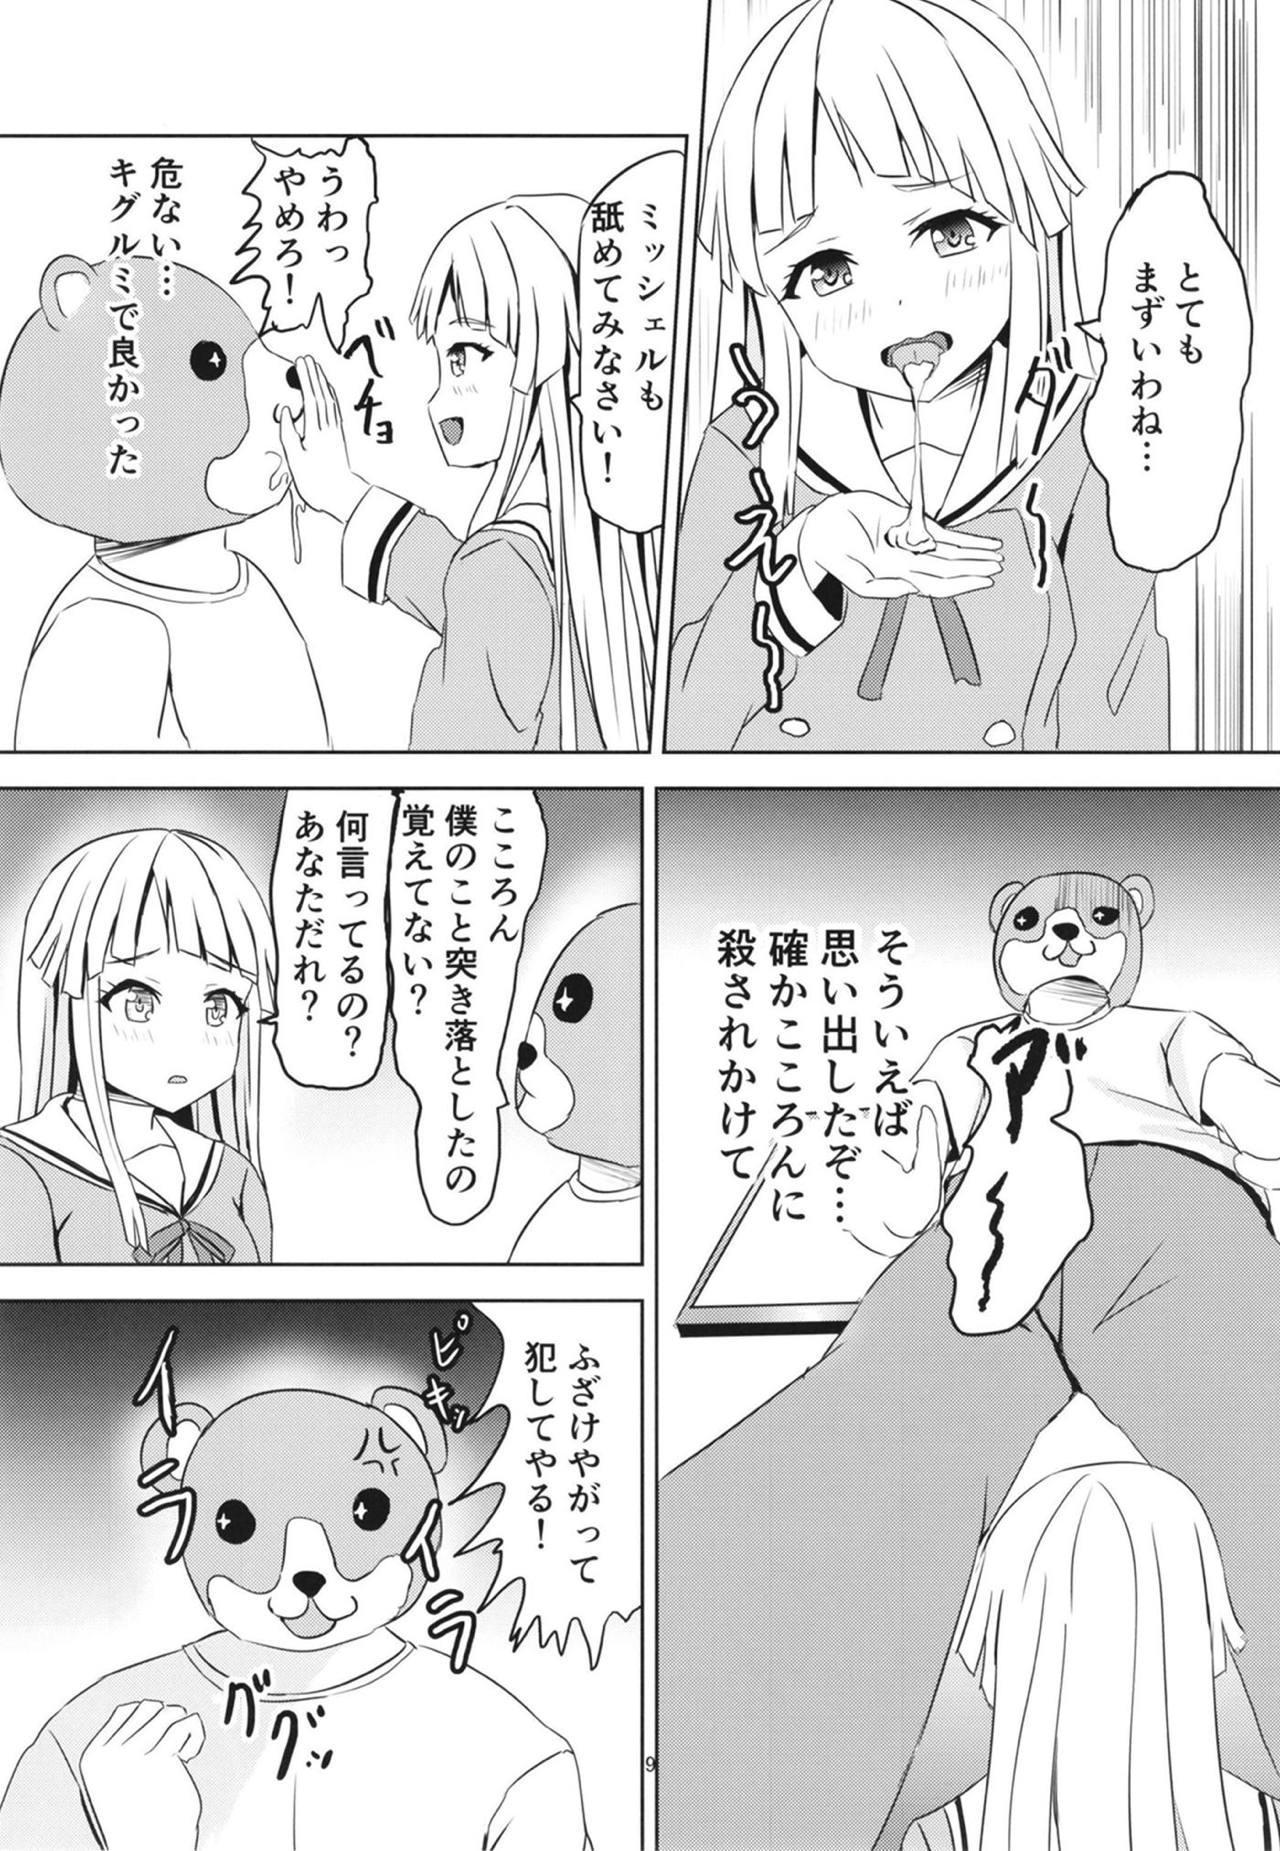 Korokoro Kokoron 9